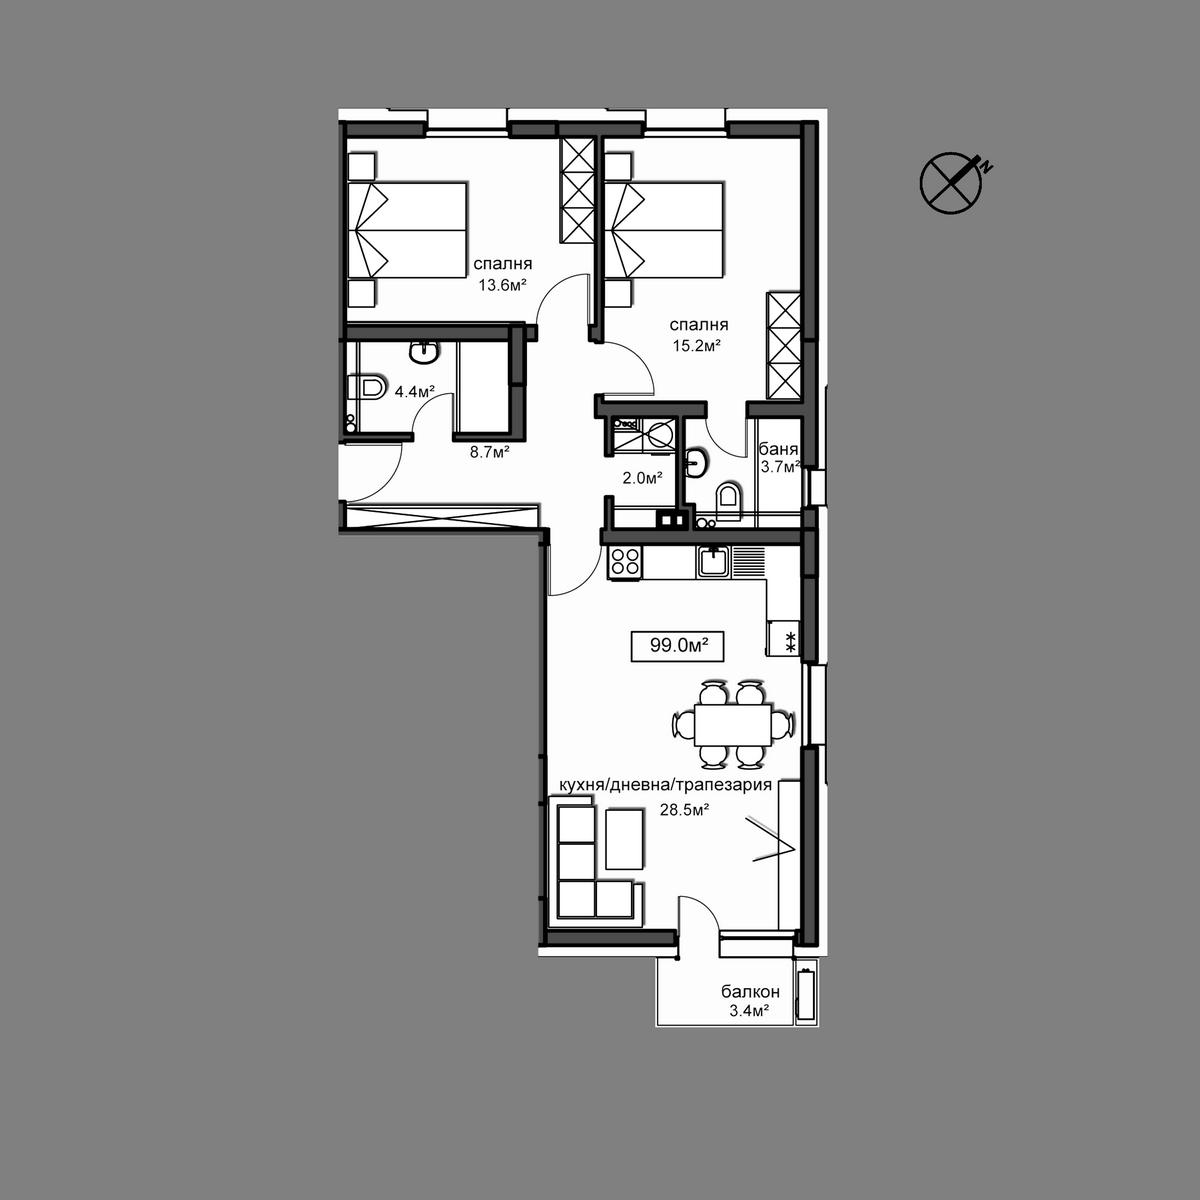 Продава апартамент ново строителство - Апартамент Б14